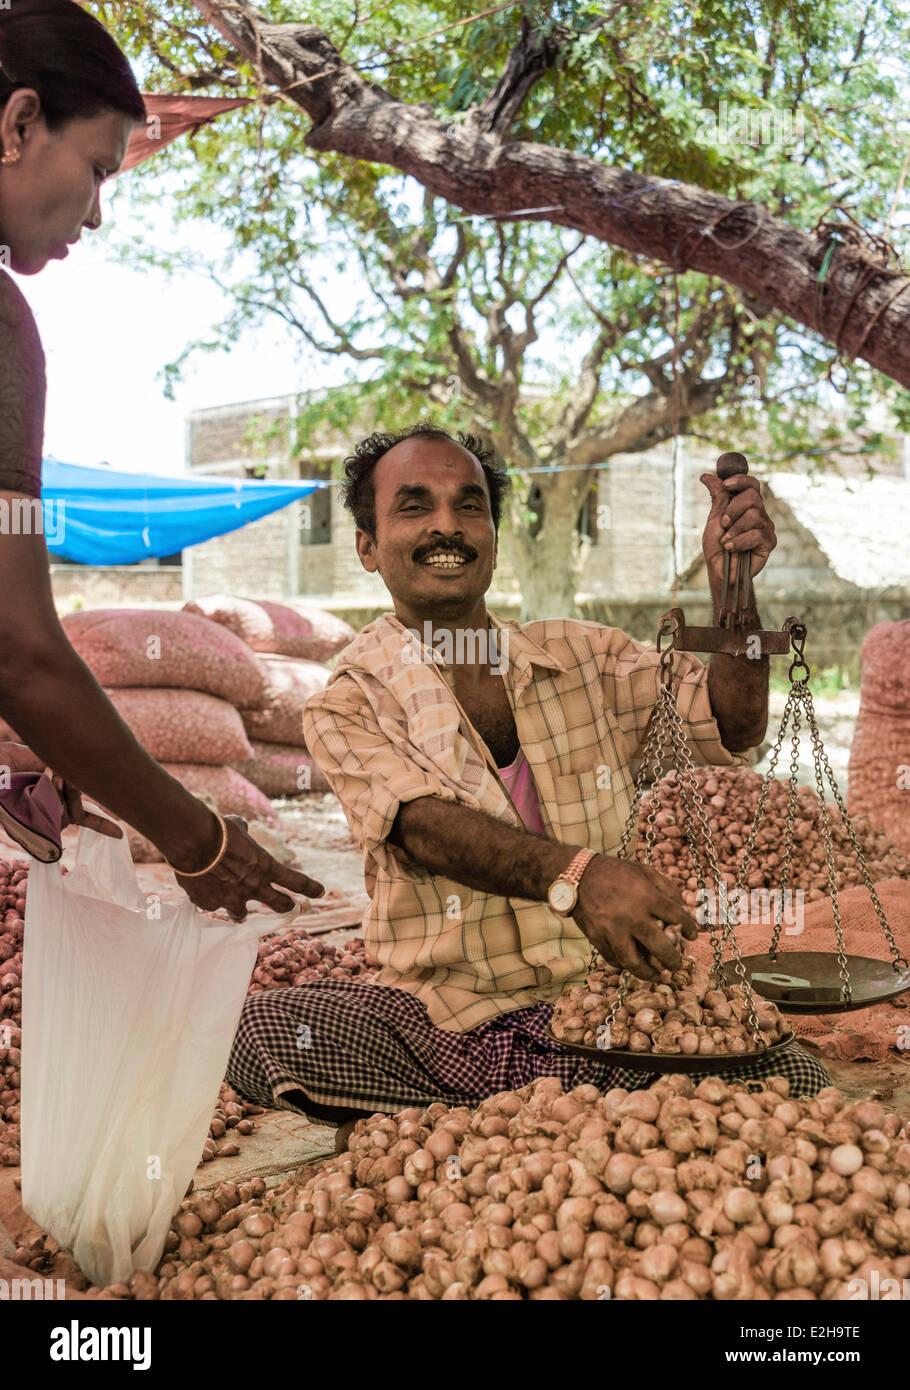 Cheerful vendor holding scales, Indian market, Chinnamanur, Tamil Nadu, India - Stock Image